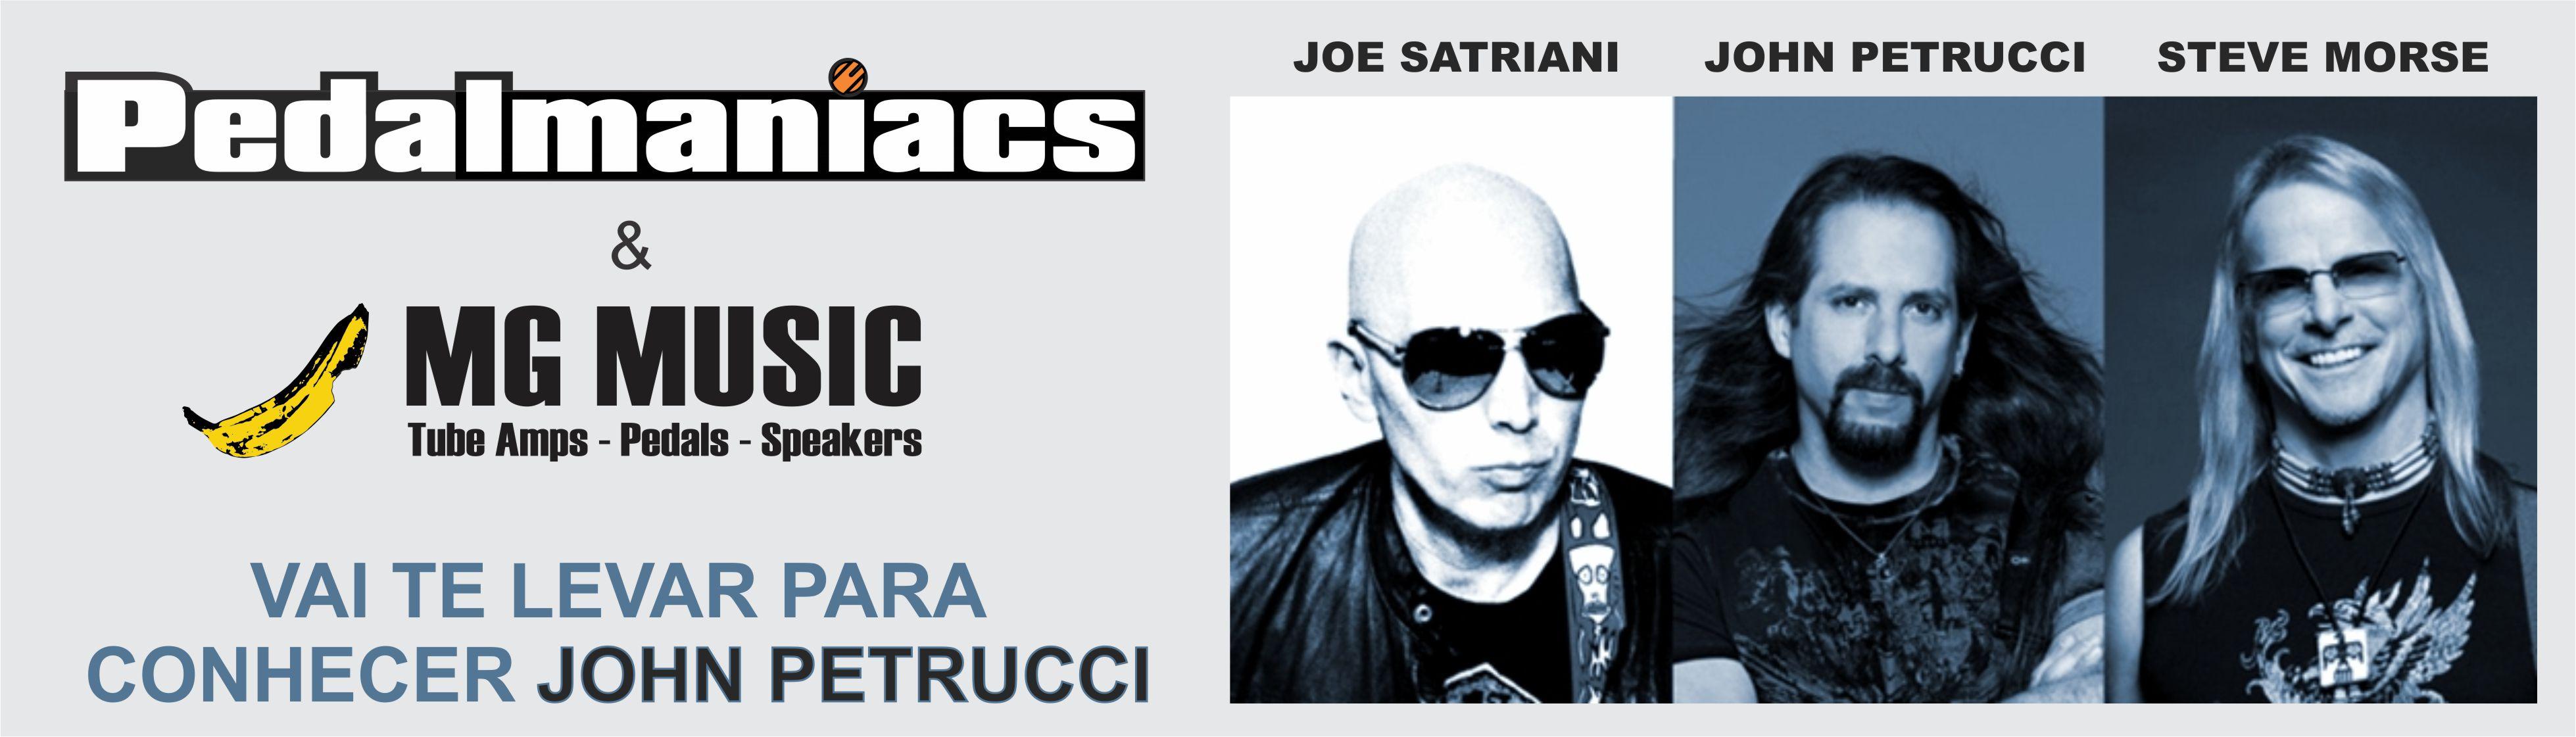 promoção pedalmaniacs mg music G3 Dream Theater John Petrucci